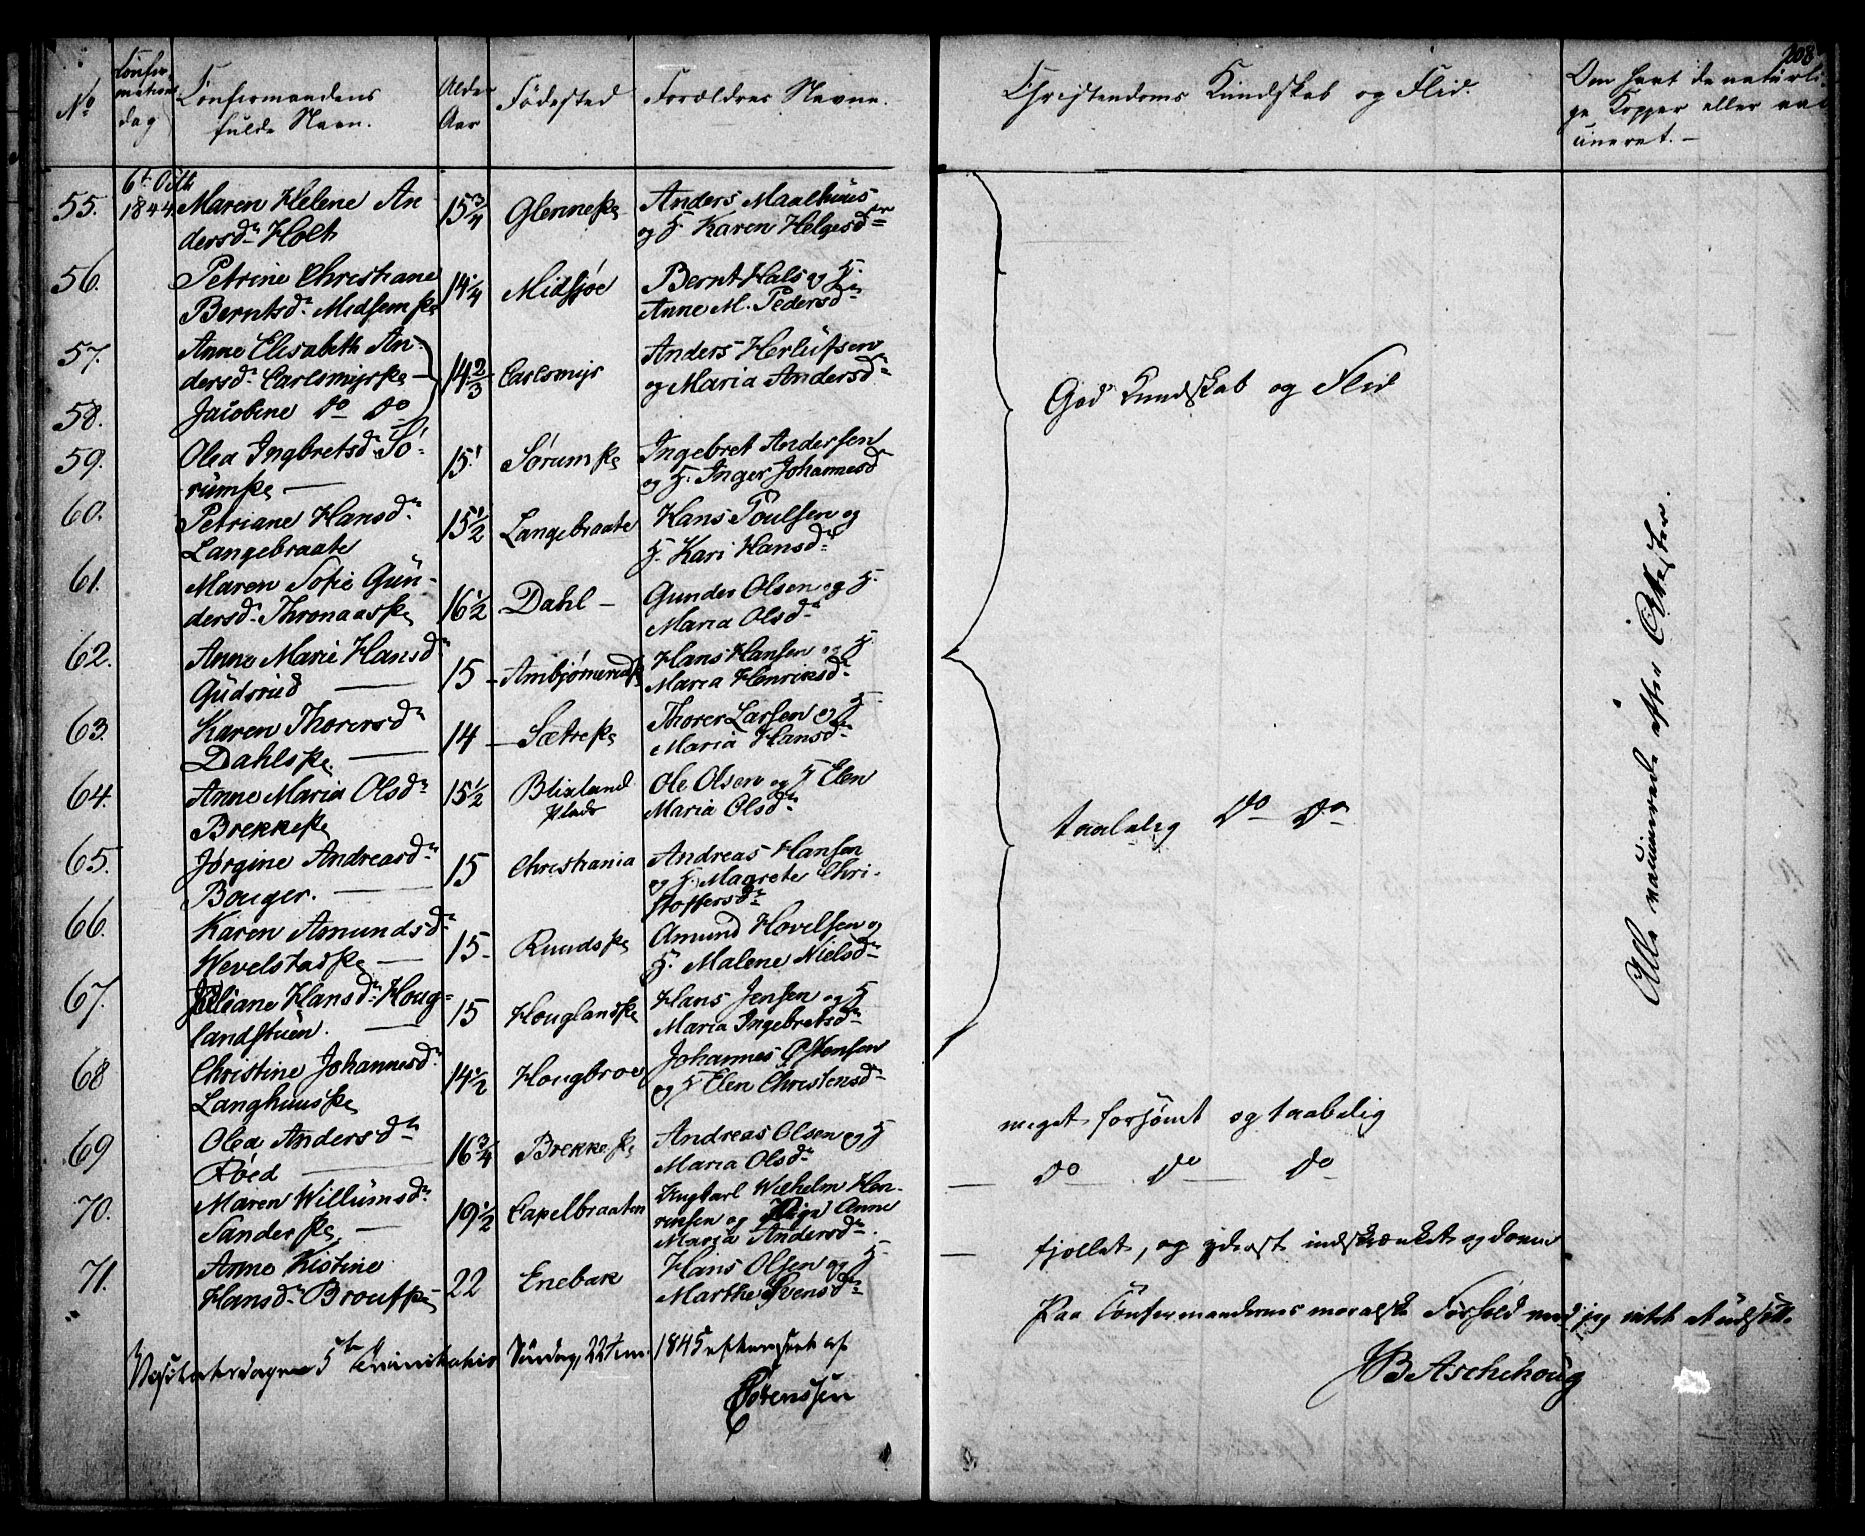 SAO, Kråkstad prestekontor Kirkebøker, F/Fa/L0005: Ministerialbok nr. I 5, 1837-1847, s. 208